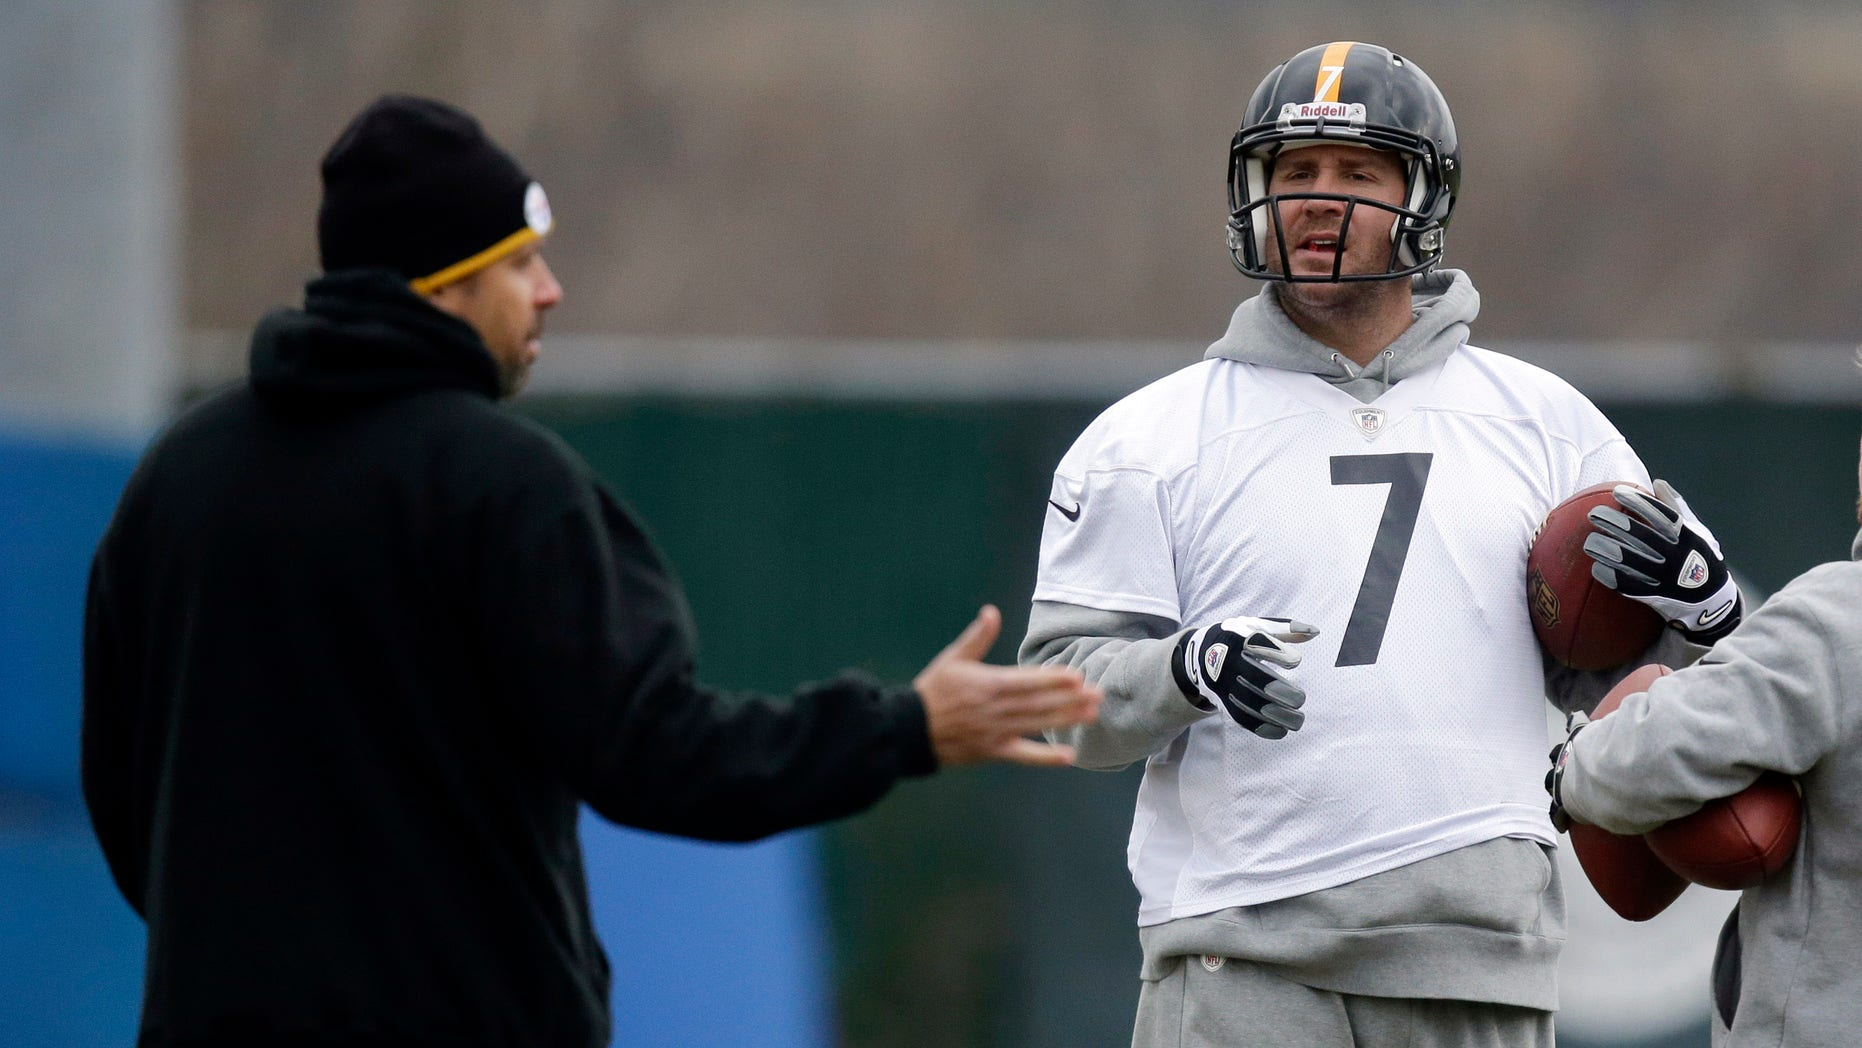 Pittsburgh Steelers quarterback Benn Roethlisberger (7) listens to offensive coordinator Todd Haley, left, during NFL football practice in Pittsburgh, Wednesday, Dec. 19, 2012. (AP Photo/Gene J. Puskar)